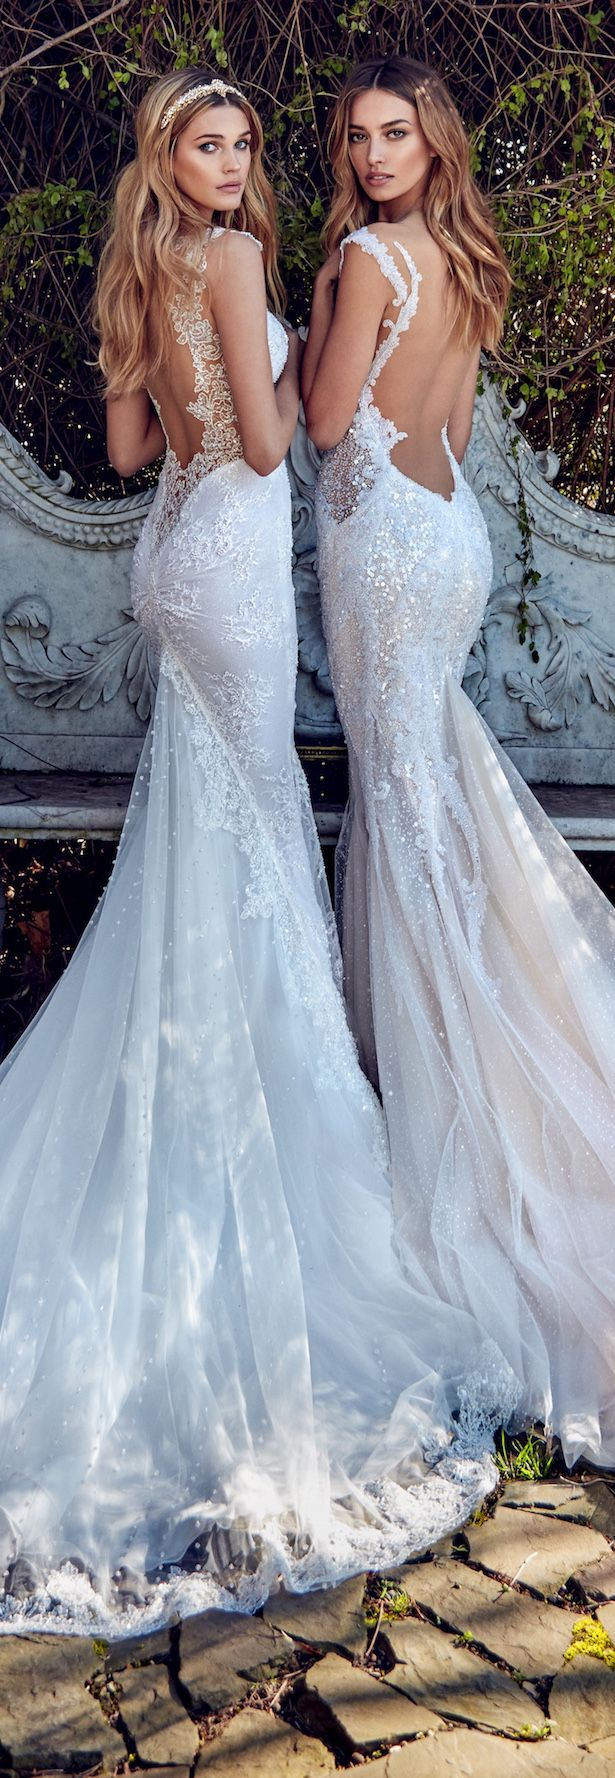 Royal themed wedding dresses   best wedding dresses images on Pinterest  Wedding dressses